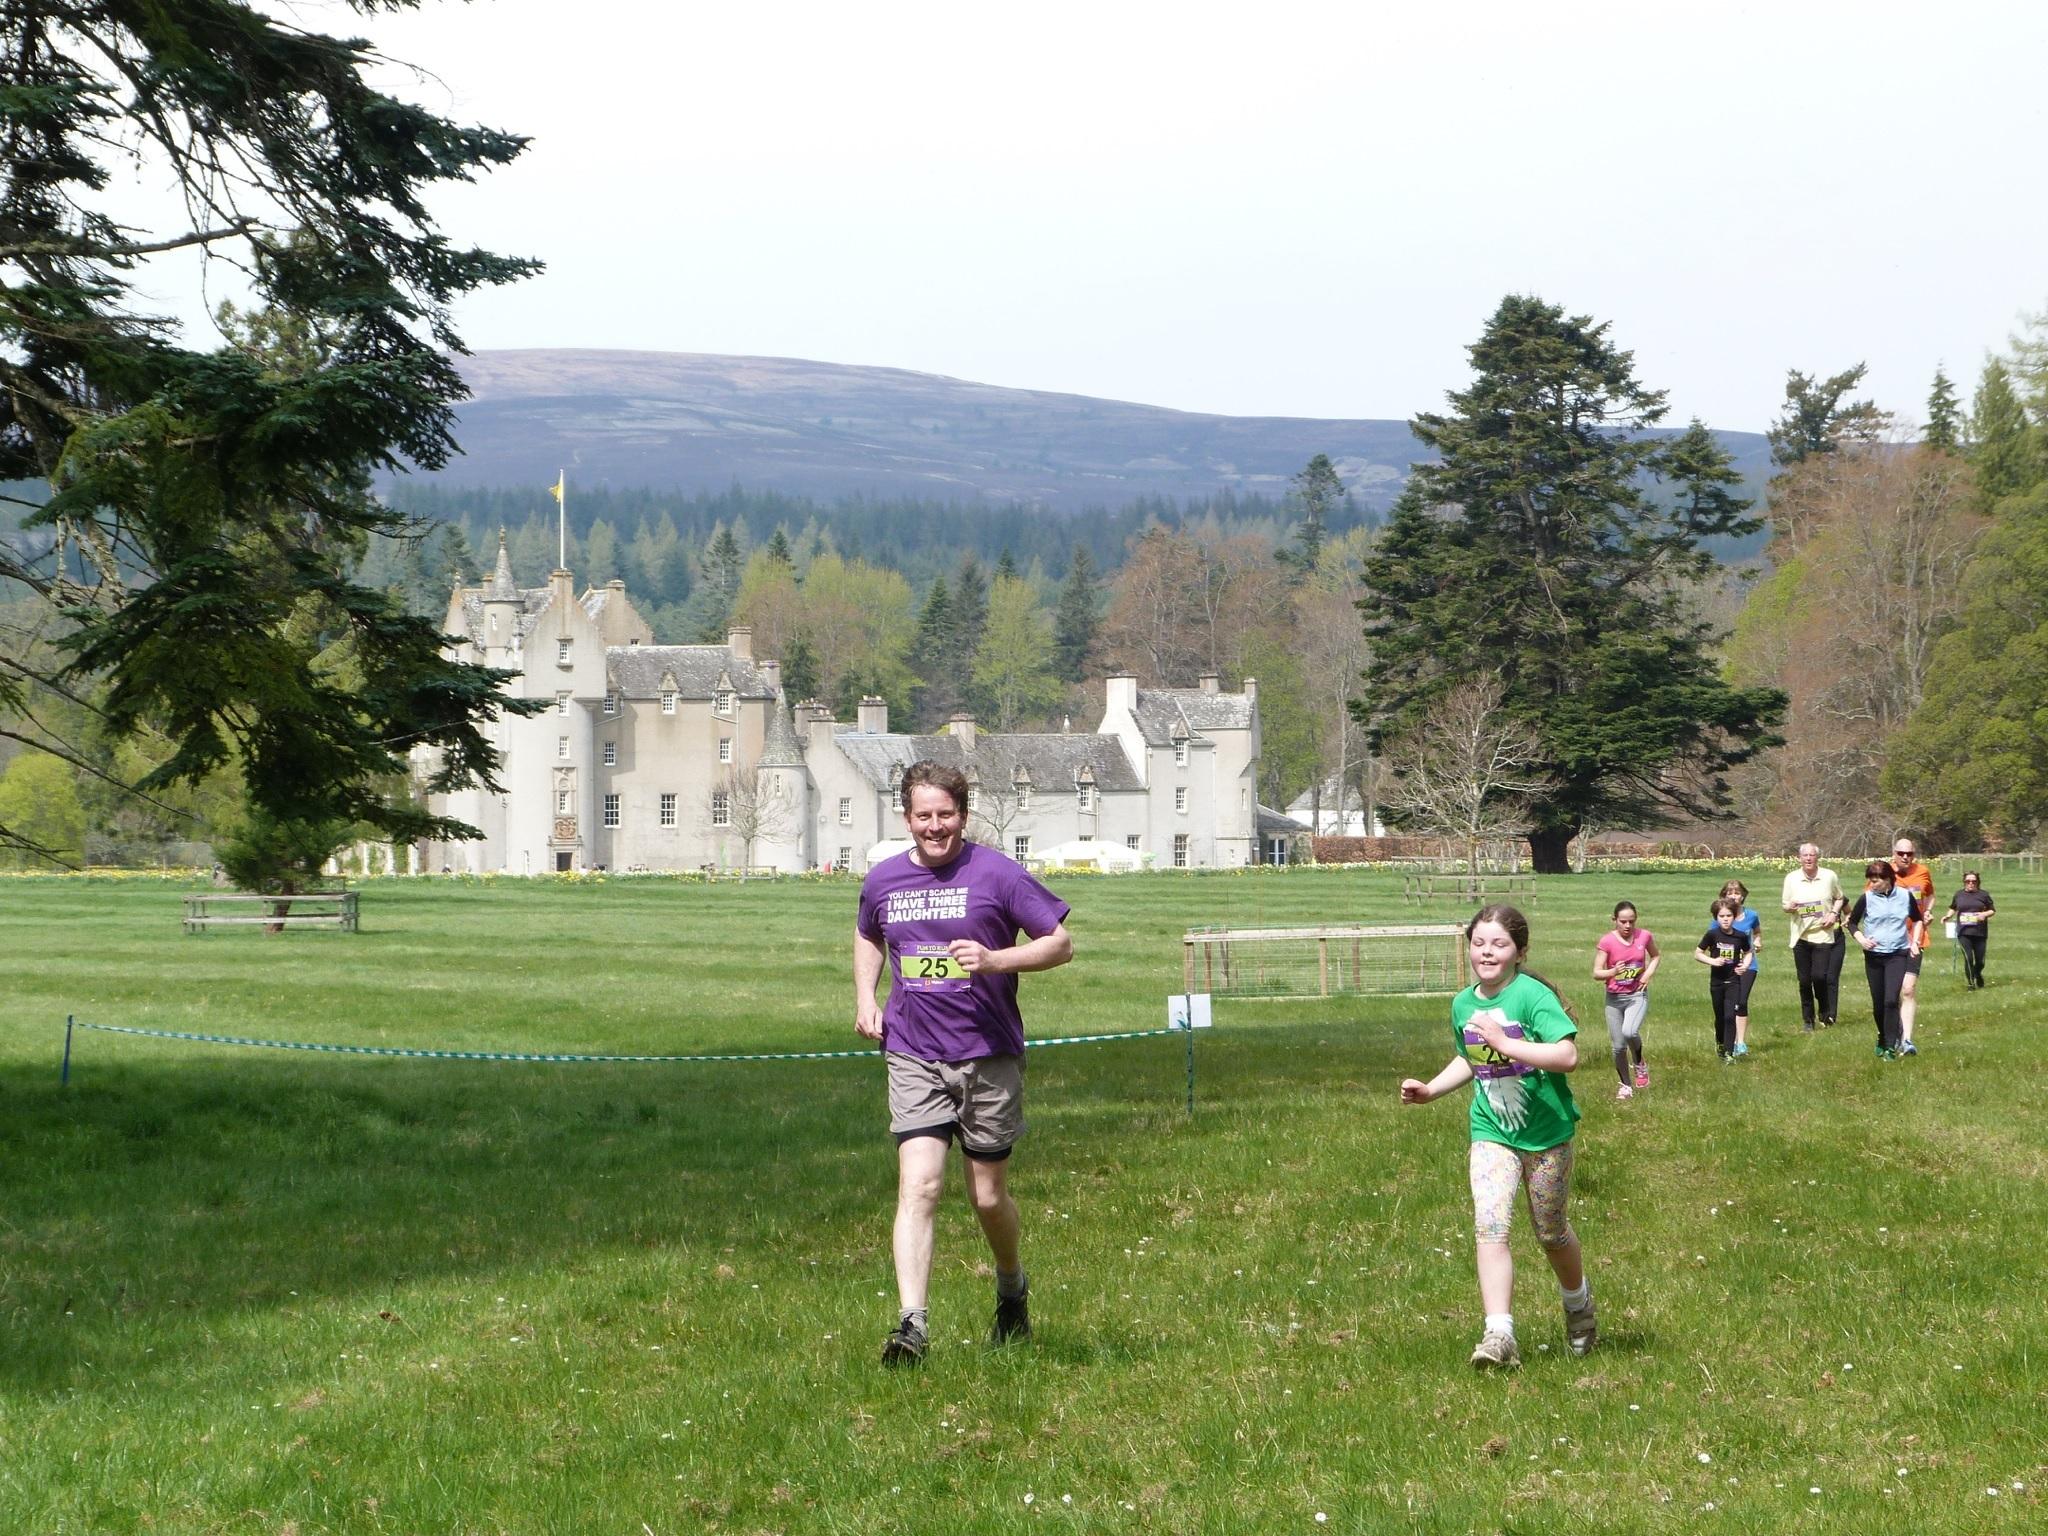 Competitors at last year's fun run